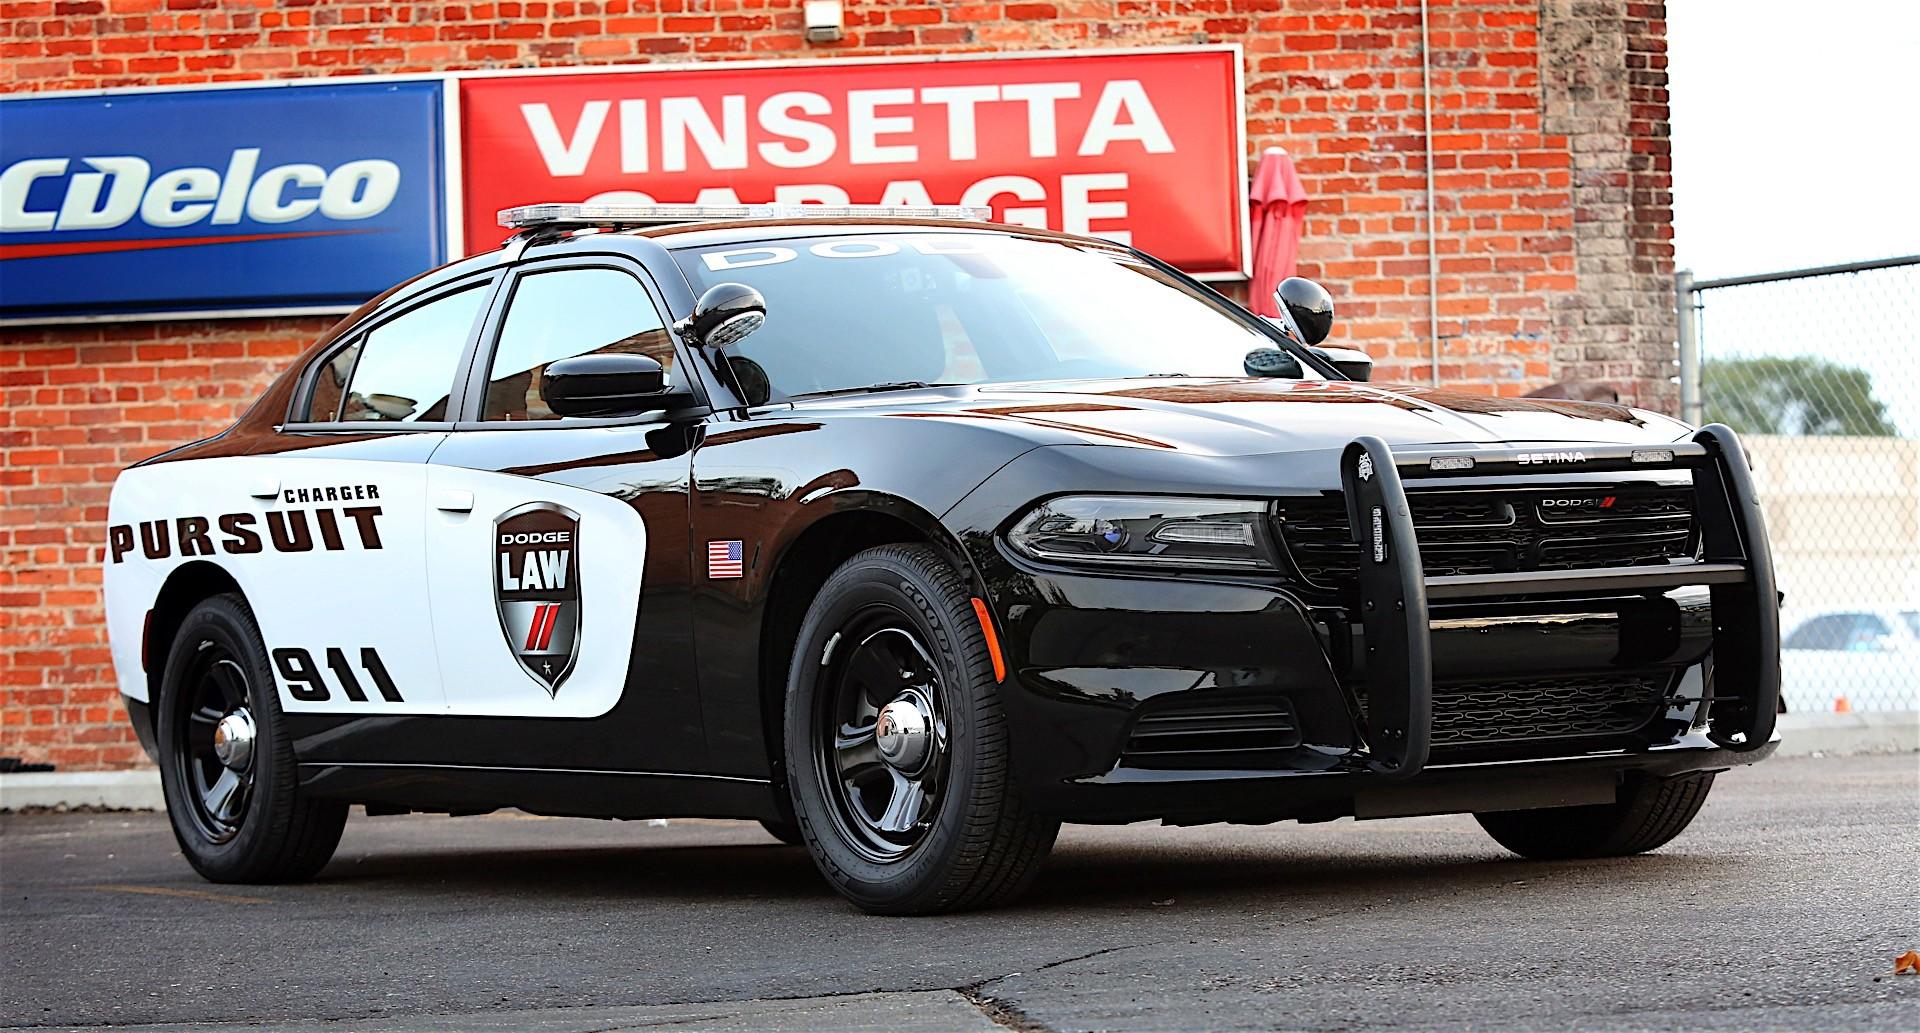 Dodge Avenger Tires >> California Highway Patrol Introduces Fleet of Dodge Charger Pursuit Vehicles - autoevolution